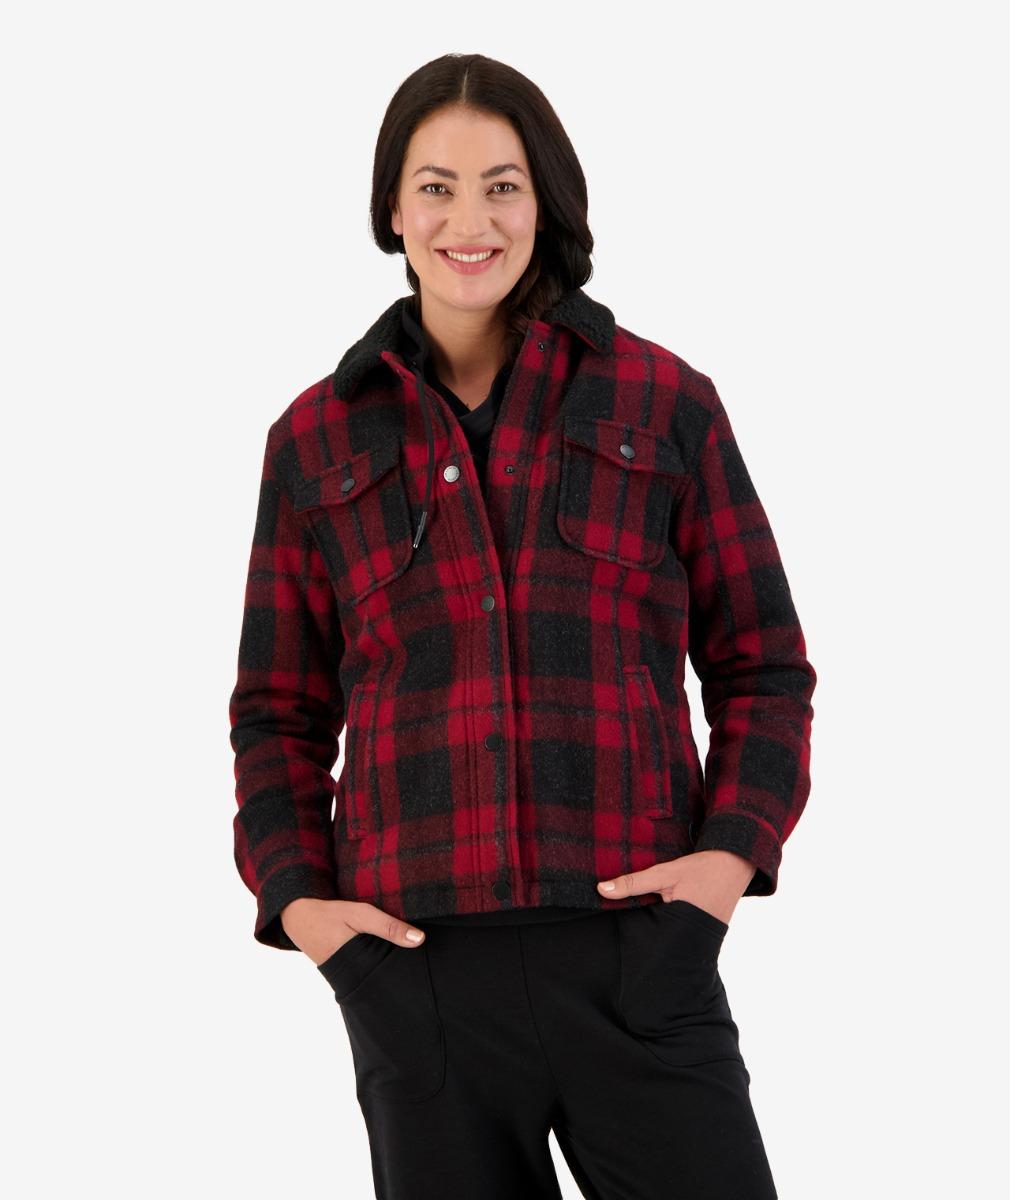 Kaituna Women's Sherpa Lined Jacket in Merlot Check